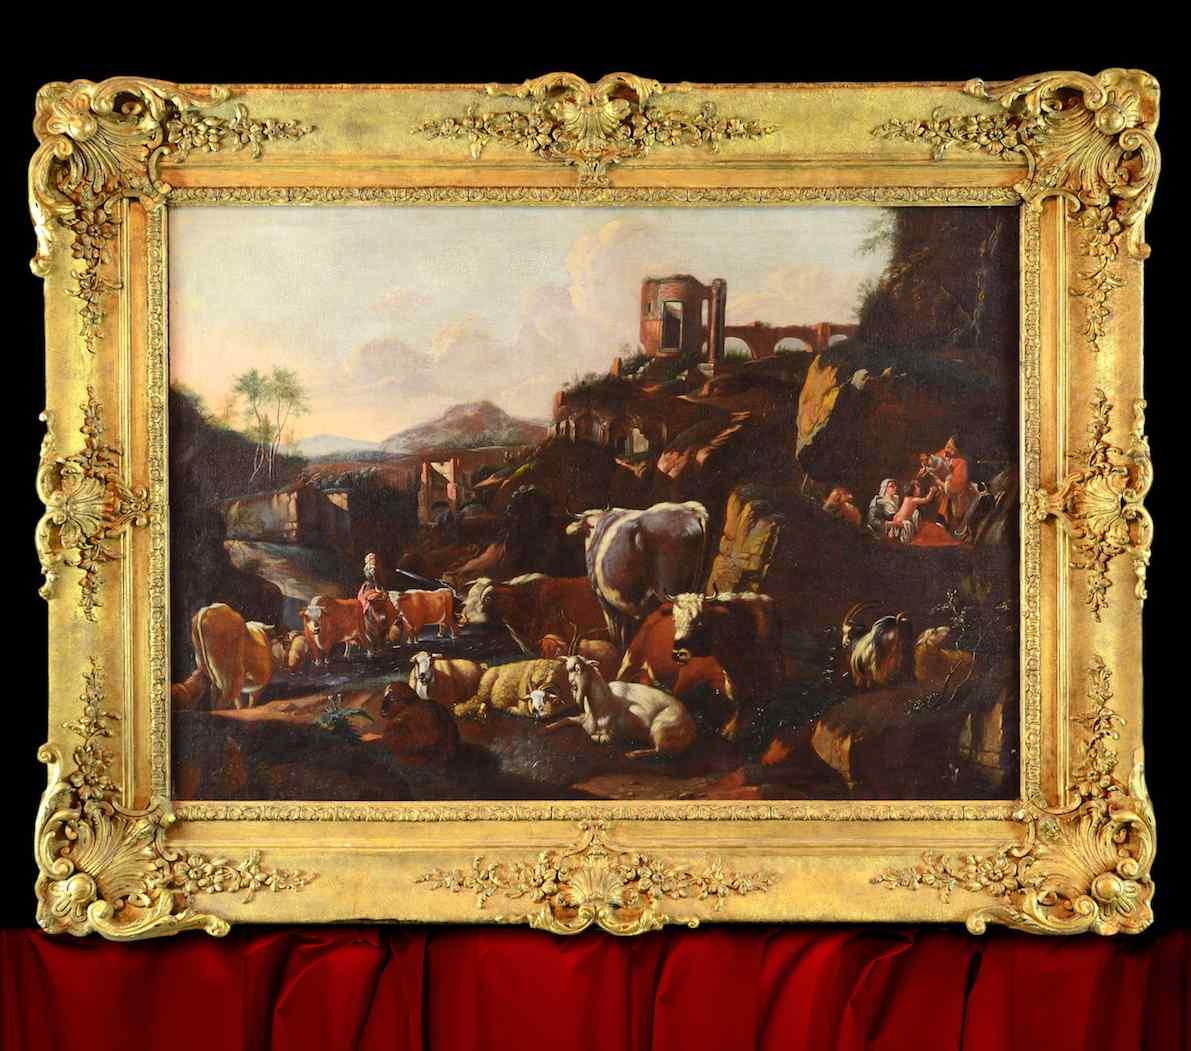 Johann Heinrich ROOS - Paesaggio romano con scena agreste